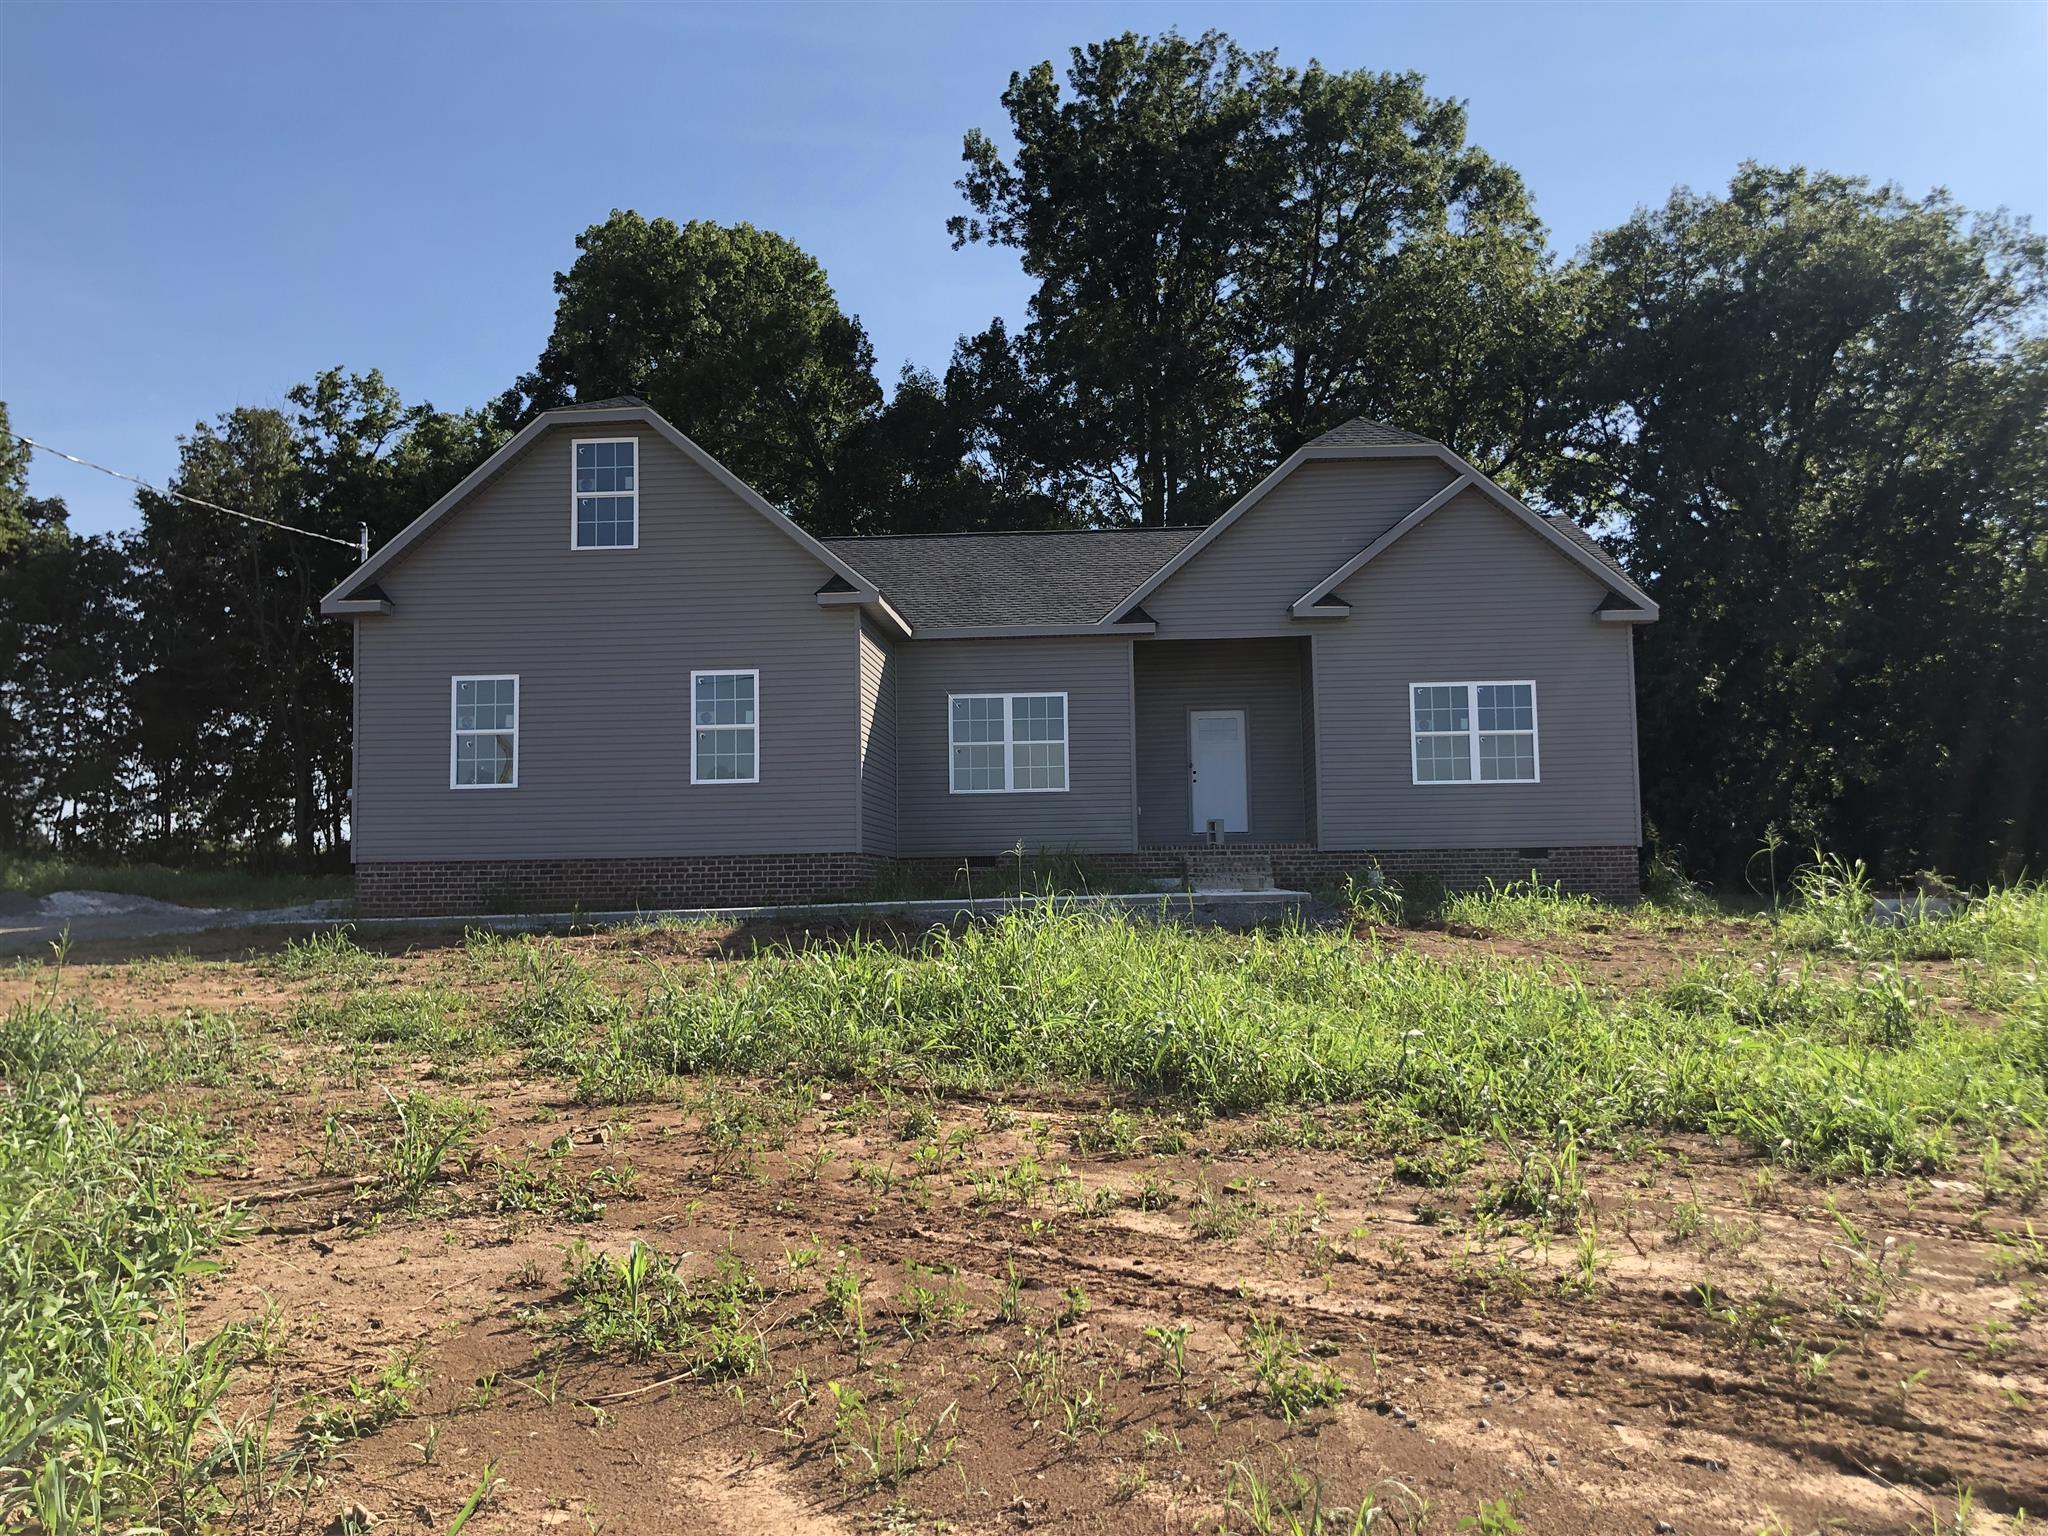 190 Hazelnut Ln, Unionville, TN 37180 - Unionville, TN real estate listing